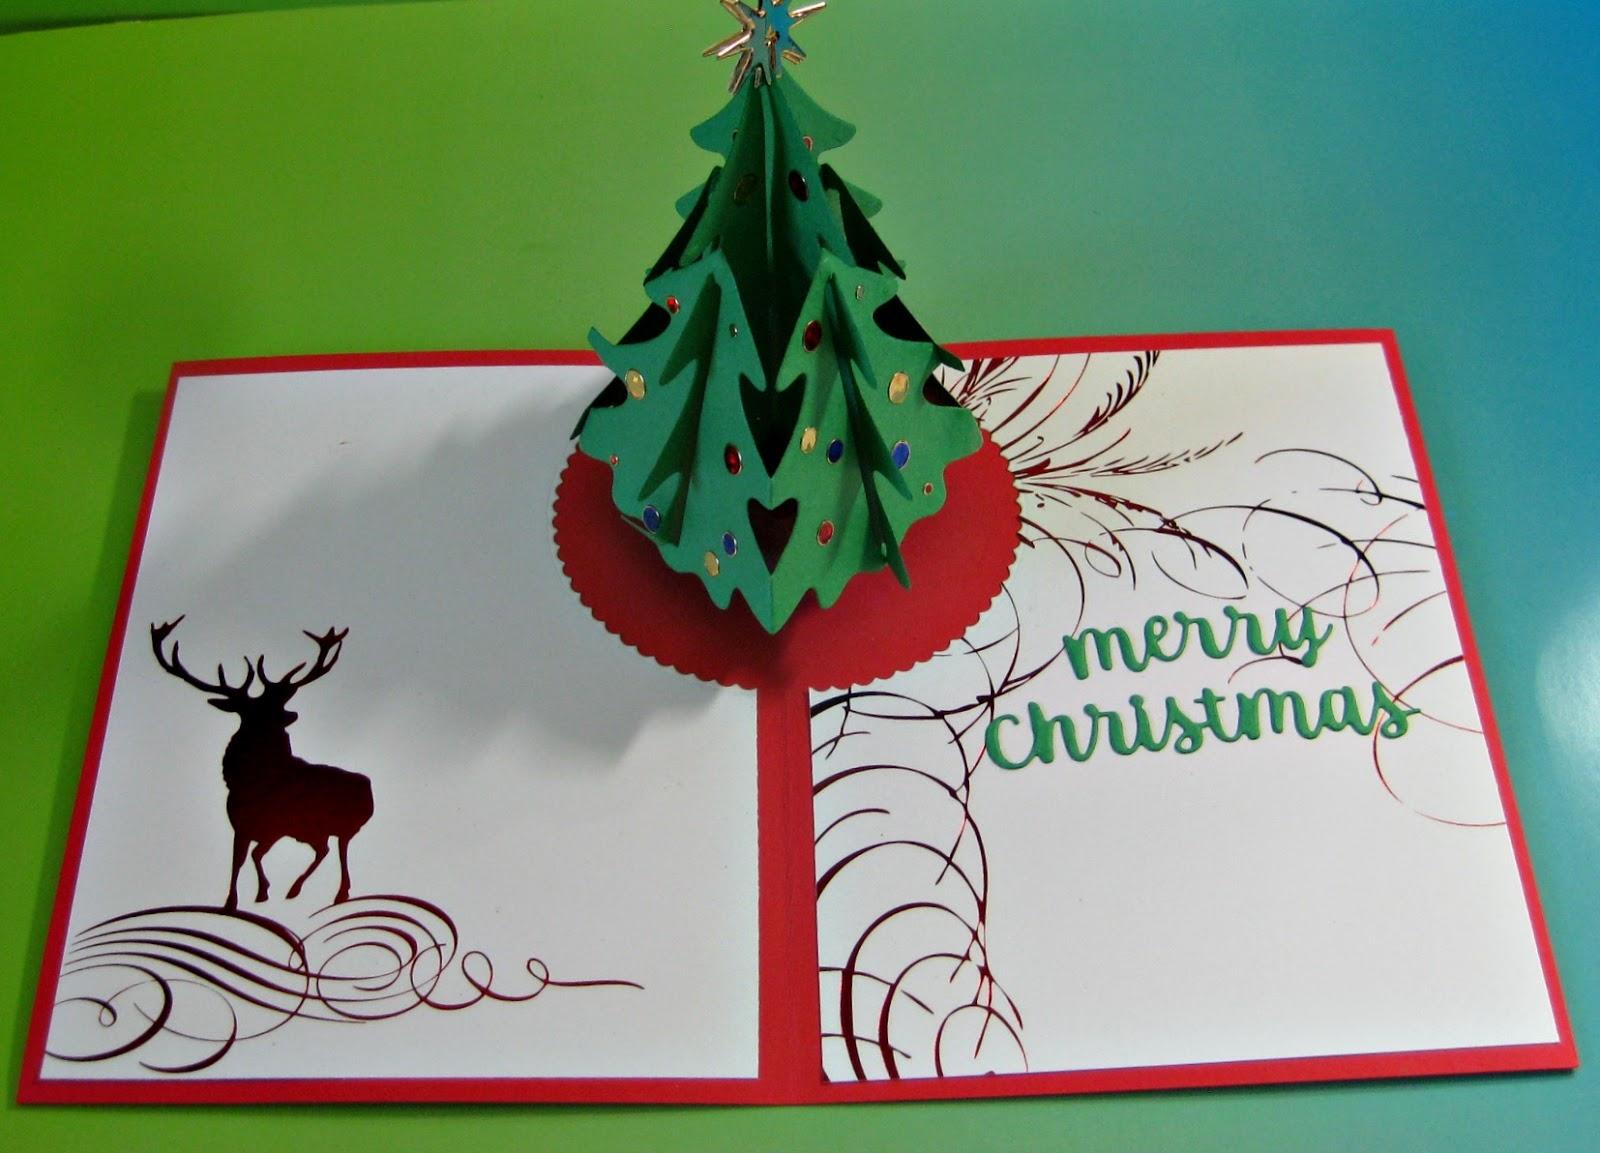 Karen's Kreative Kards: Another Pop Up Christmas Card With